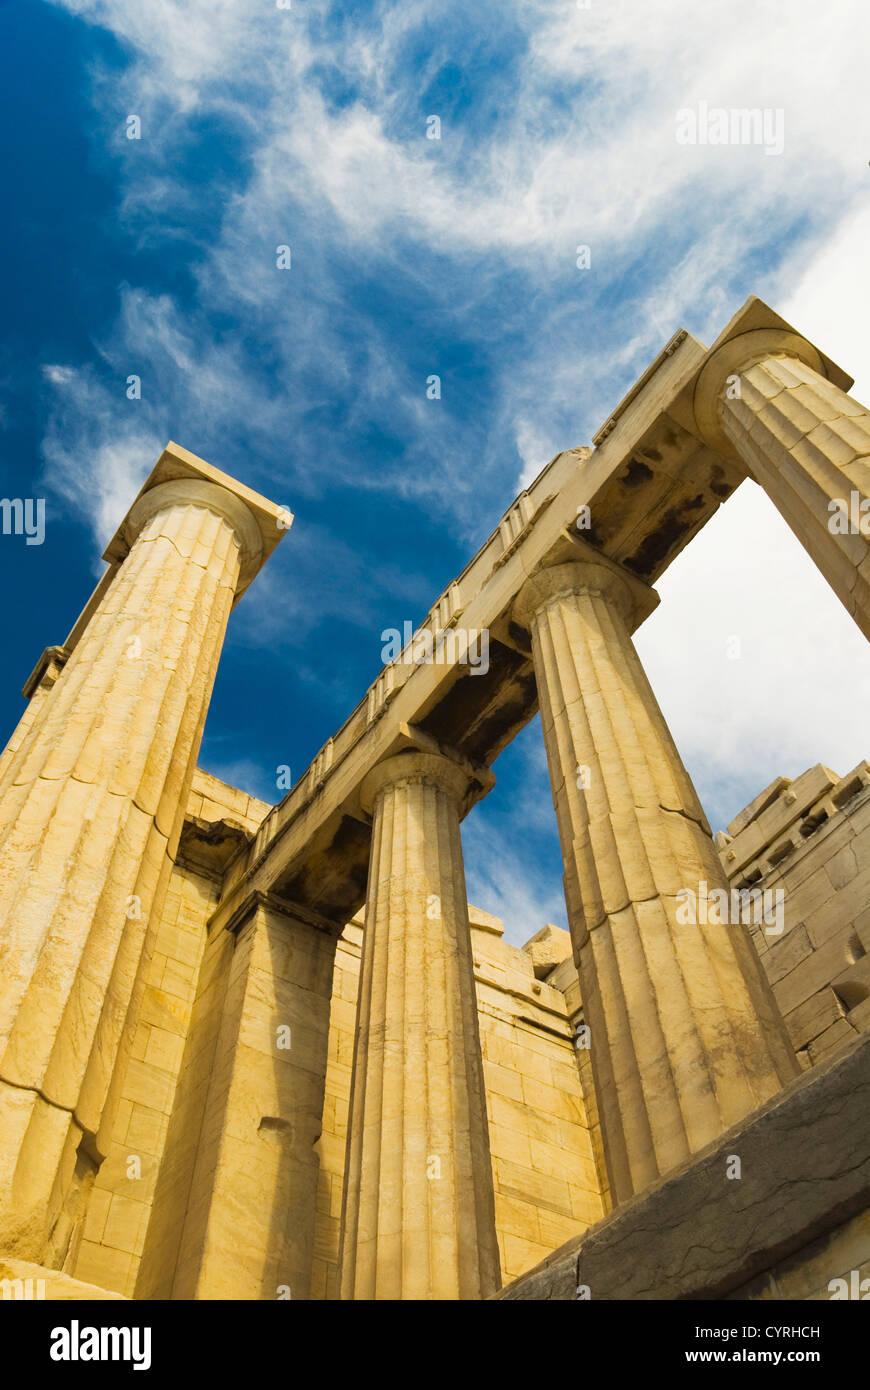 Ruins of an ancient gateway, Propylaea, Acropolis, Athens, Greece Stock Photo